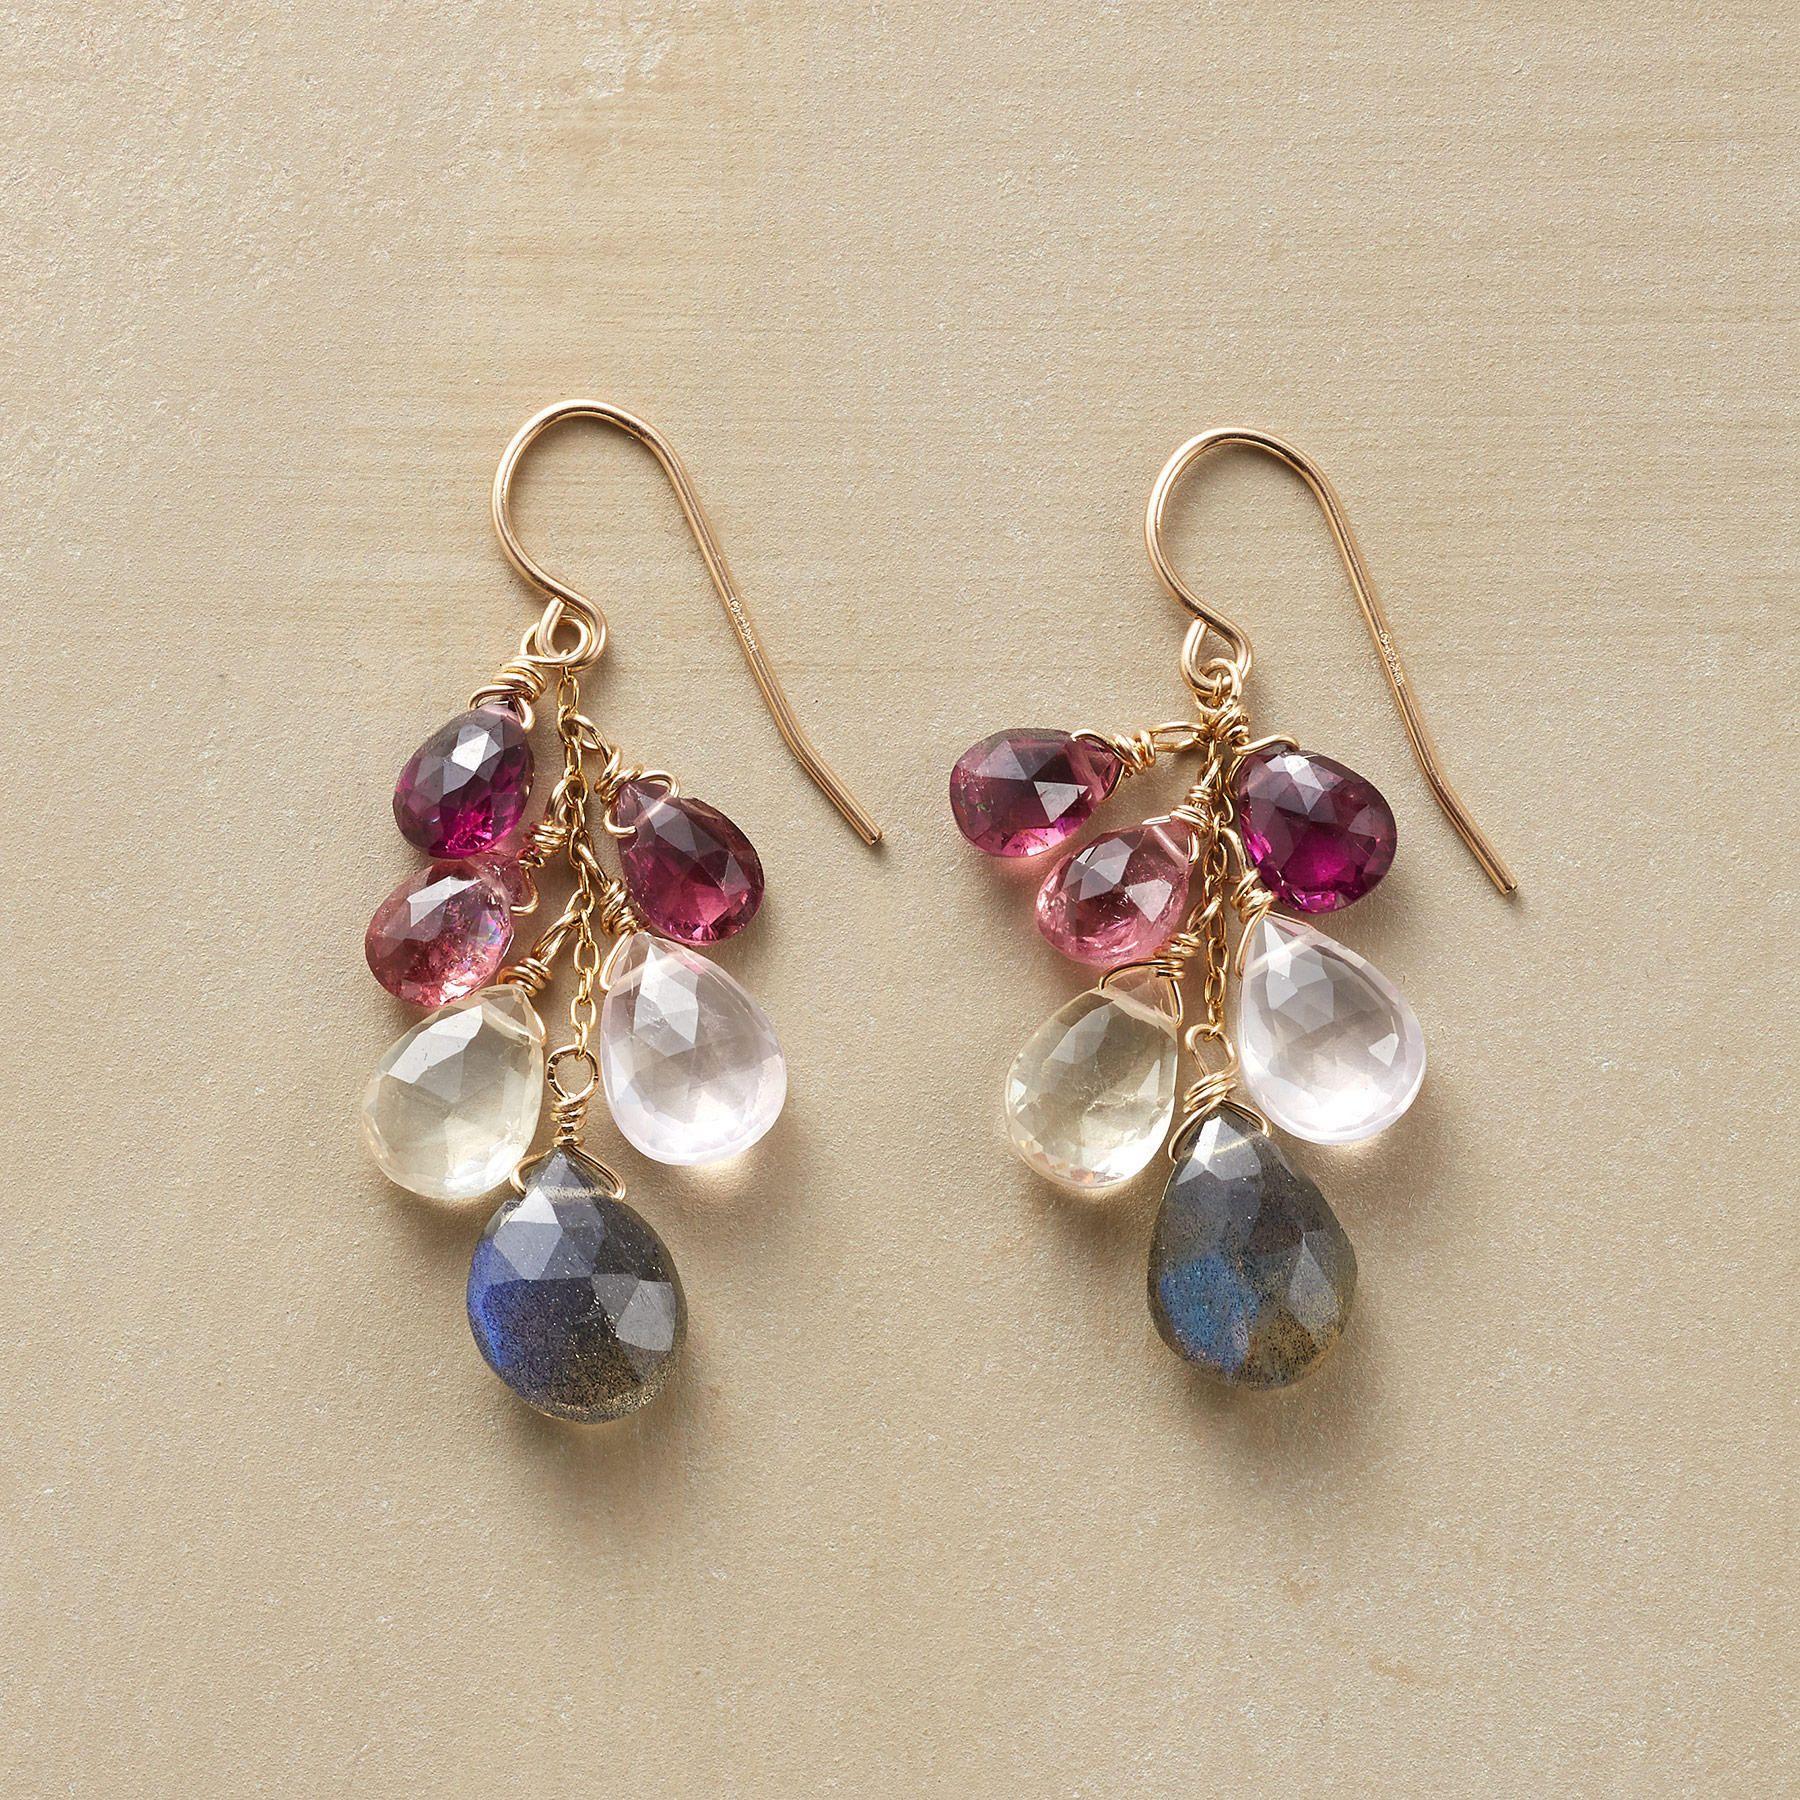 Brio Cascade Earrings - Pair Of Thoi Vo Gemstone